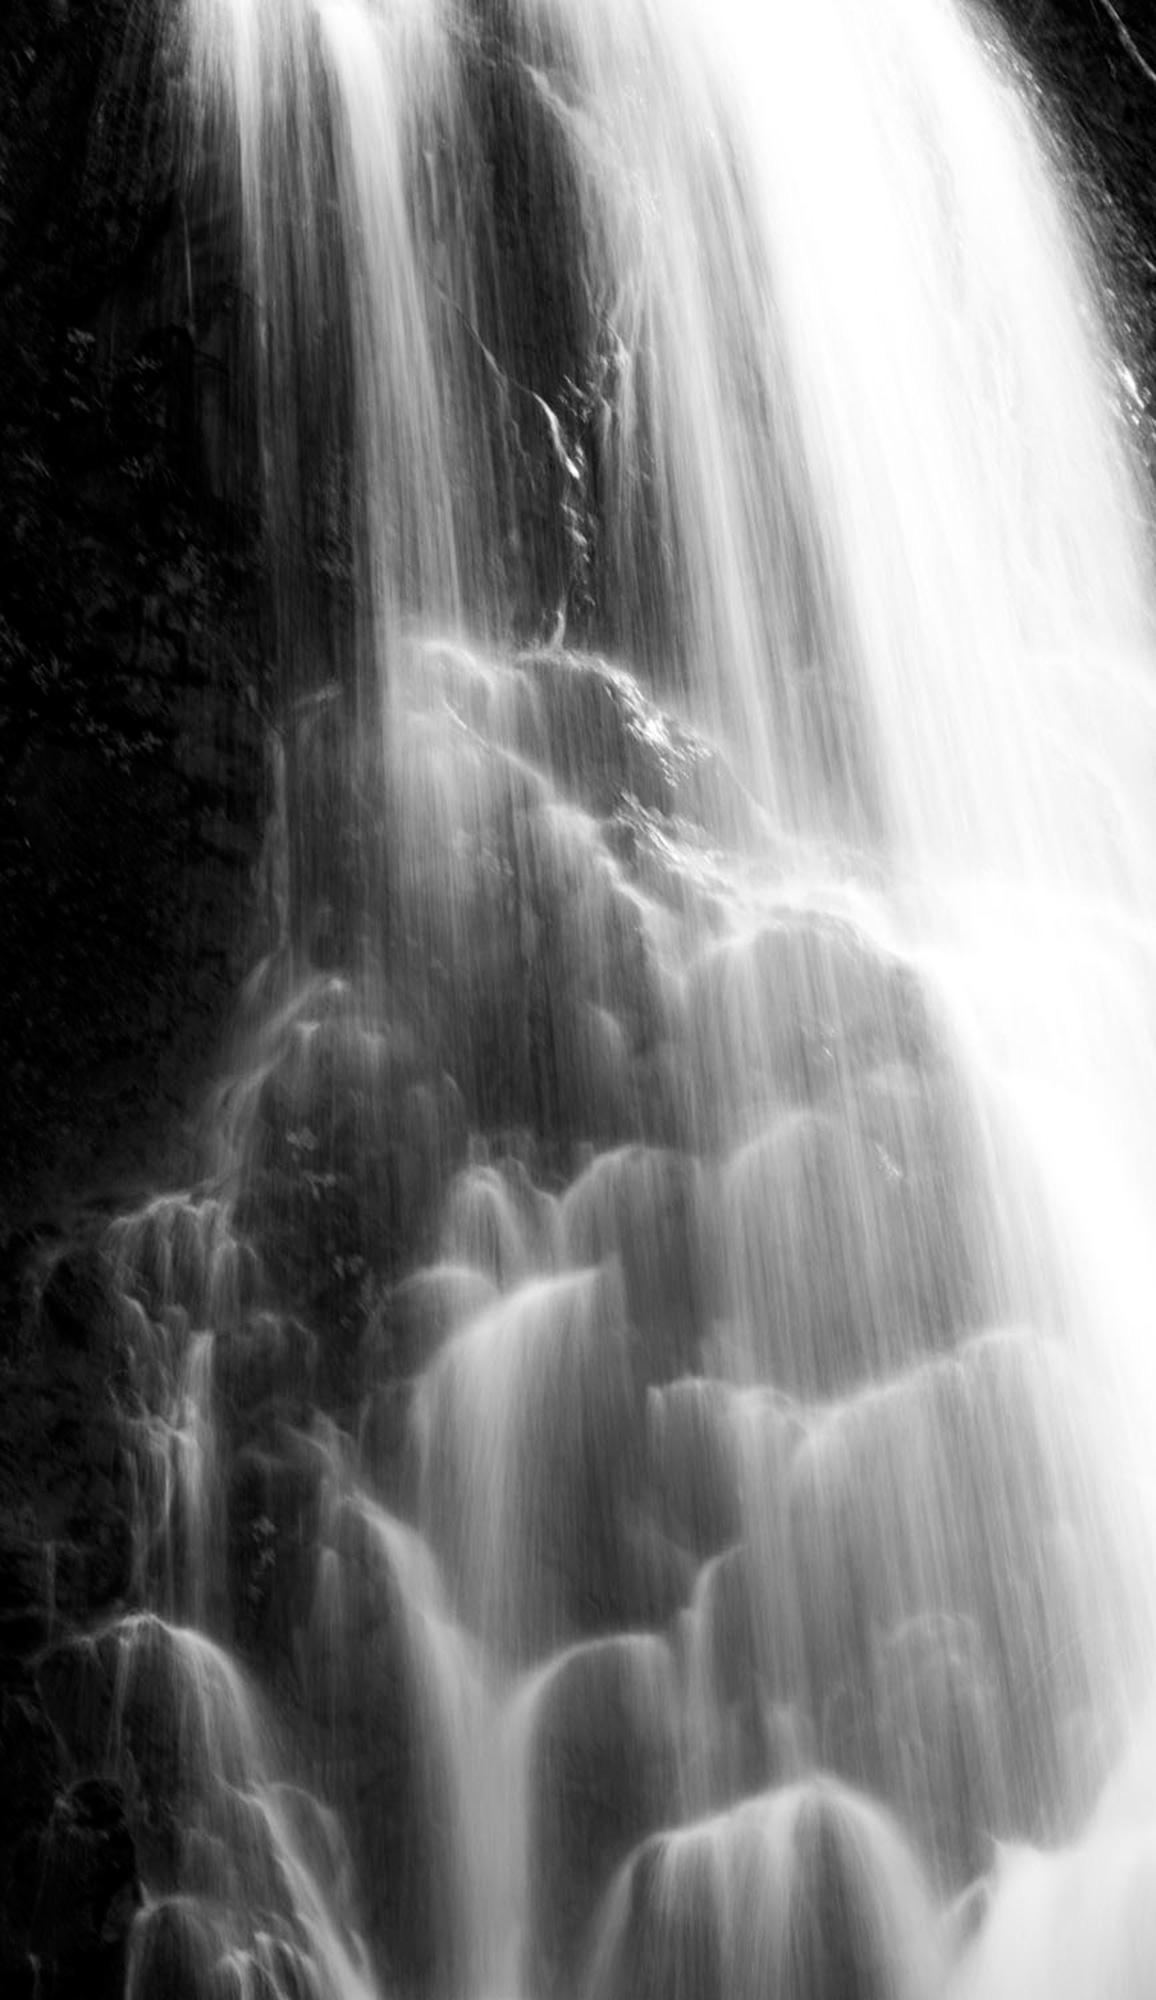 Schrack Waterfall No. 2